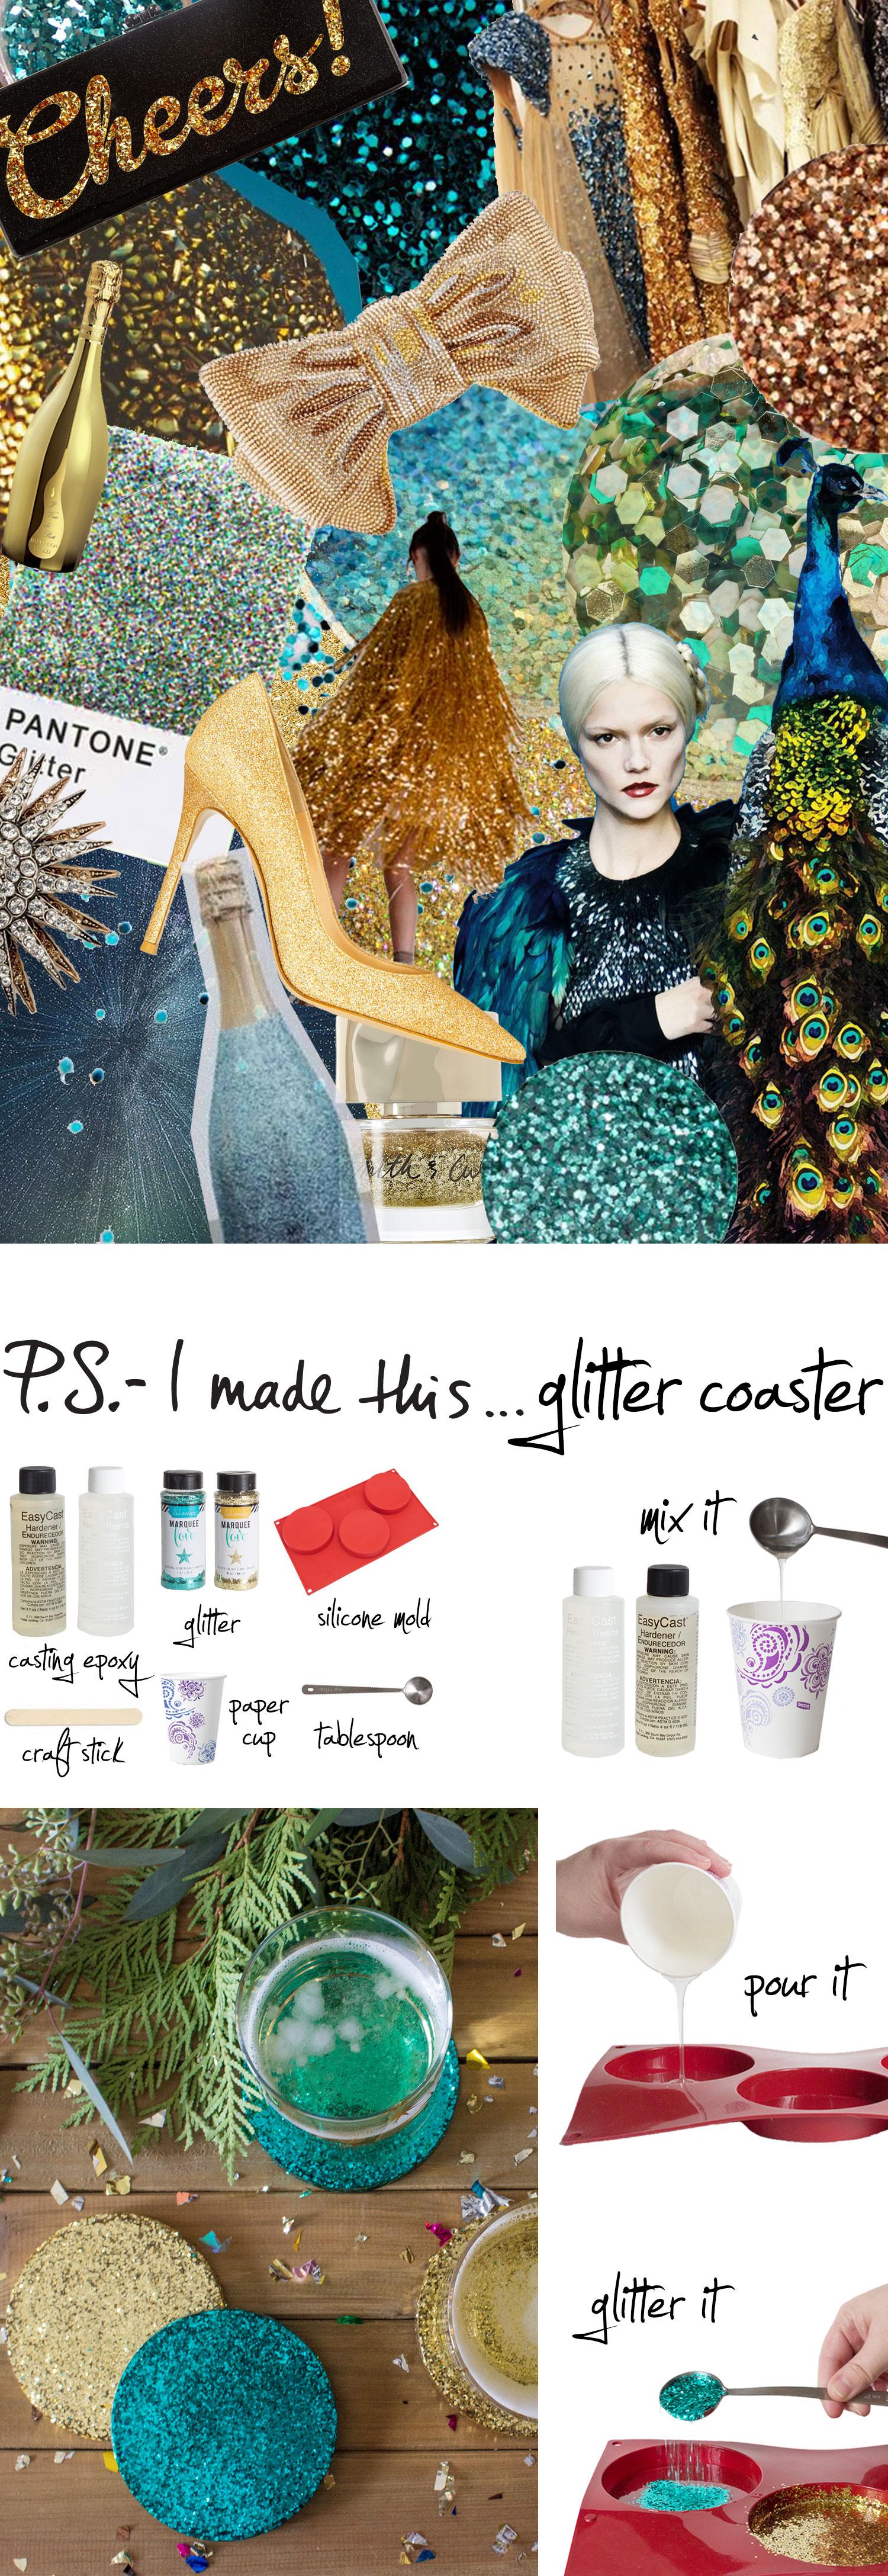 12.28.15_Glitter-Coaster2